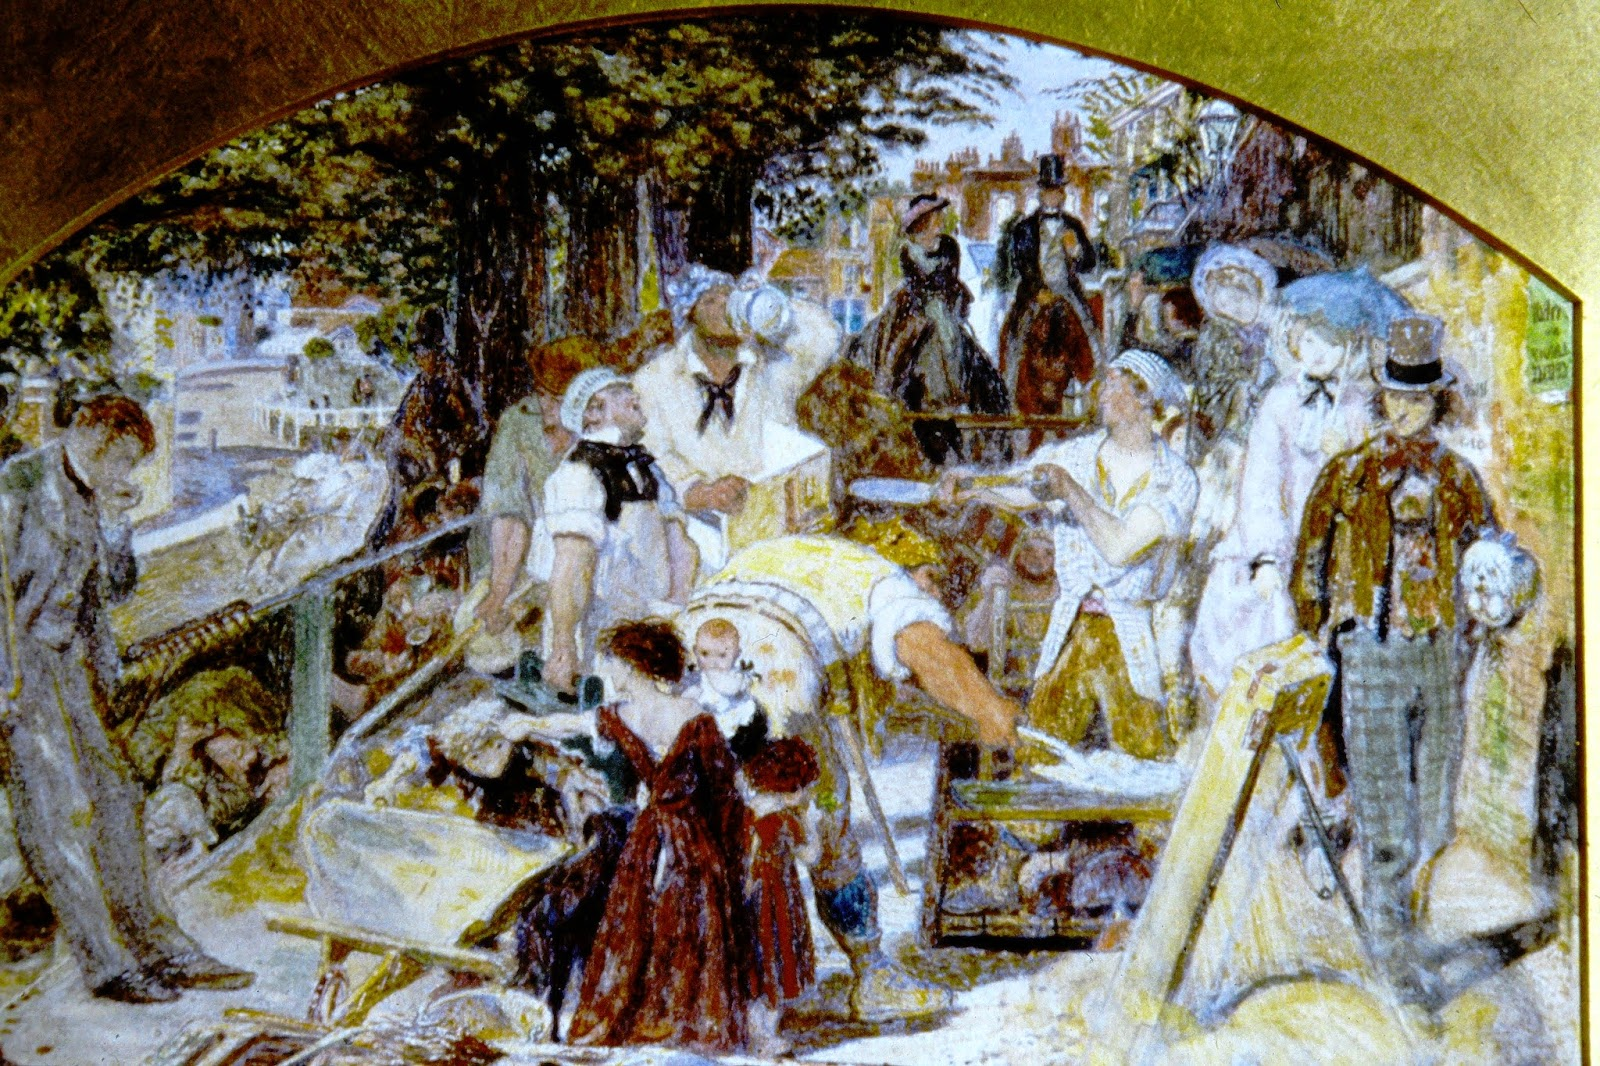 Art, Painting, people